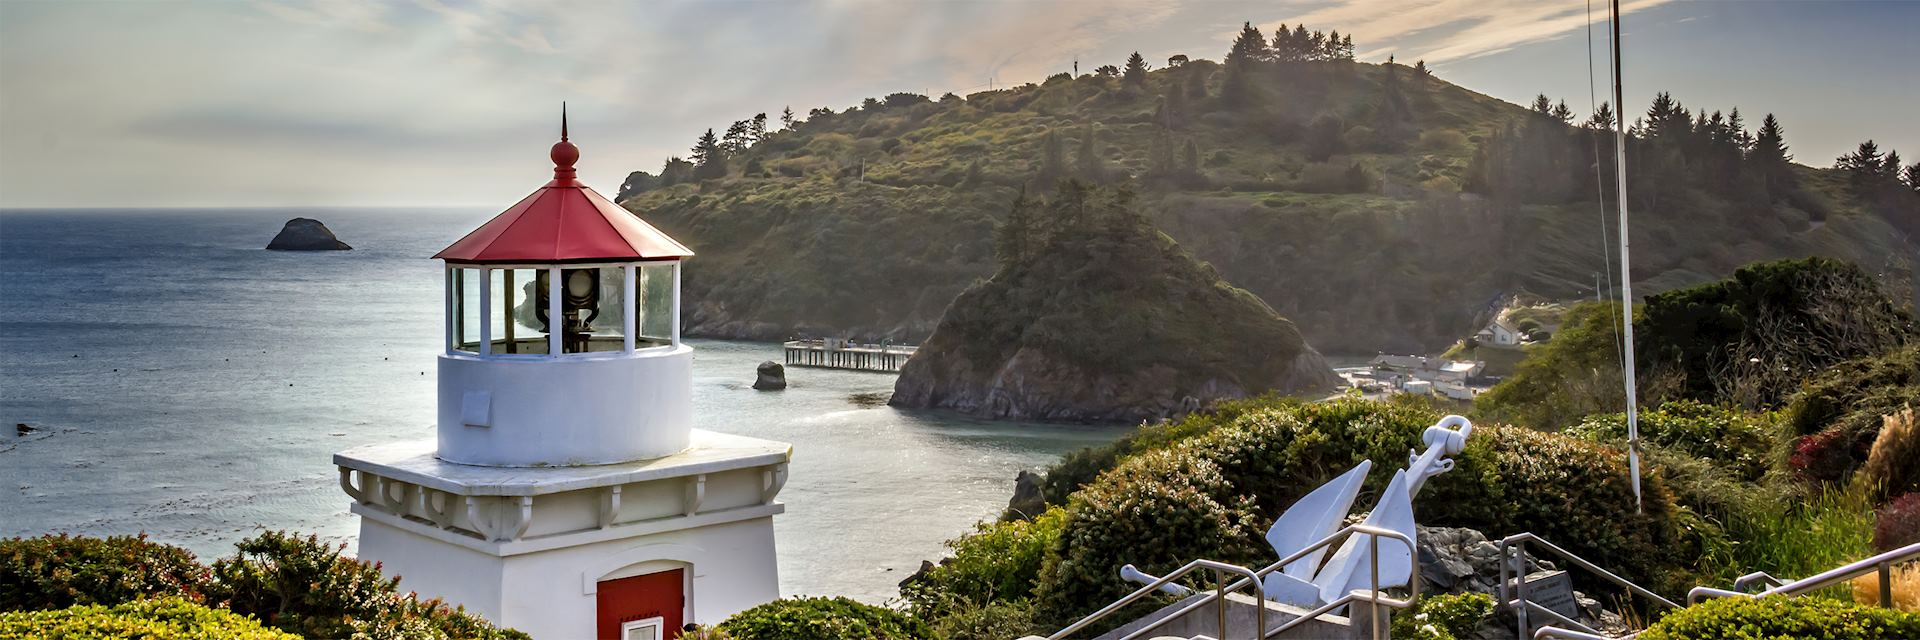 Trinidad Memorial Lighthouse, California